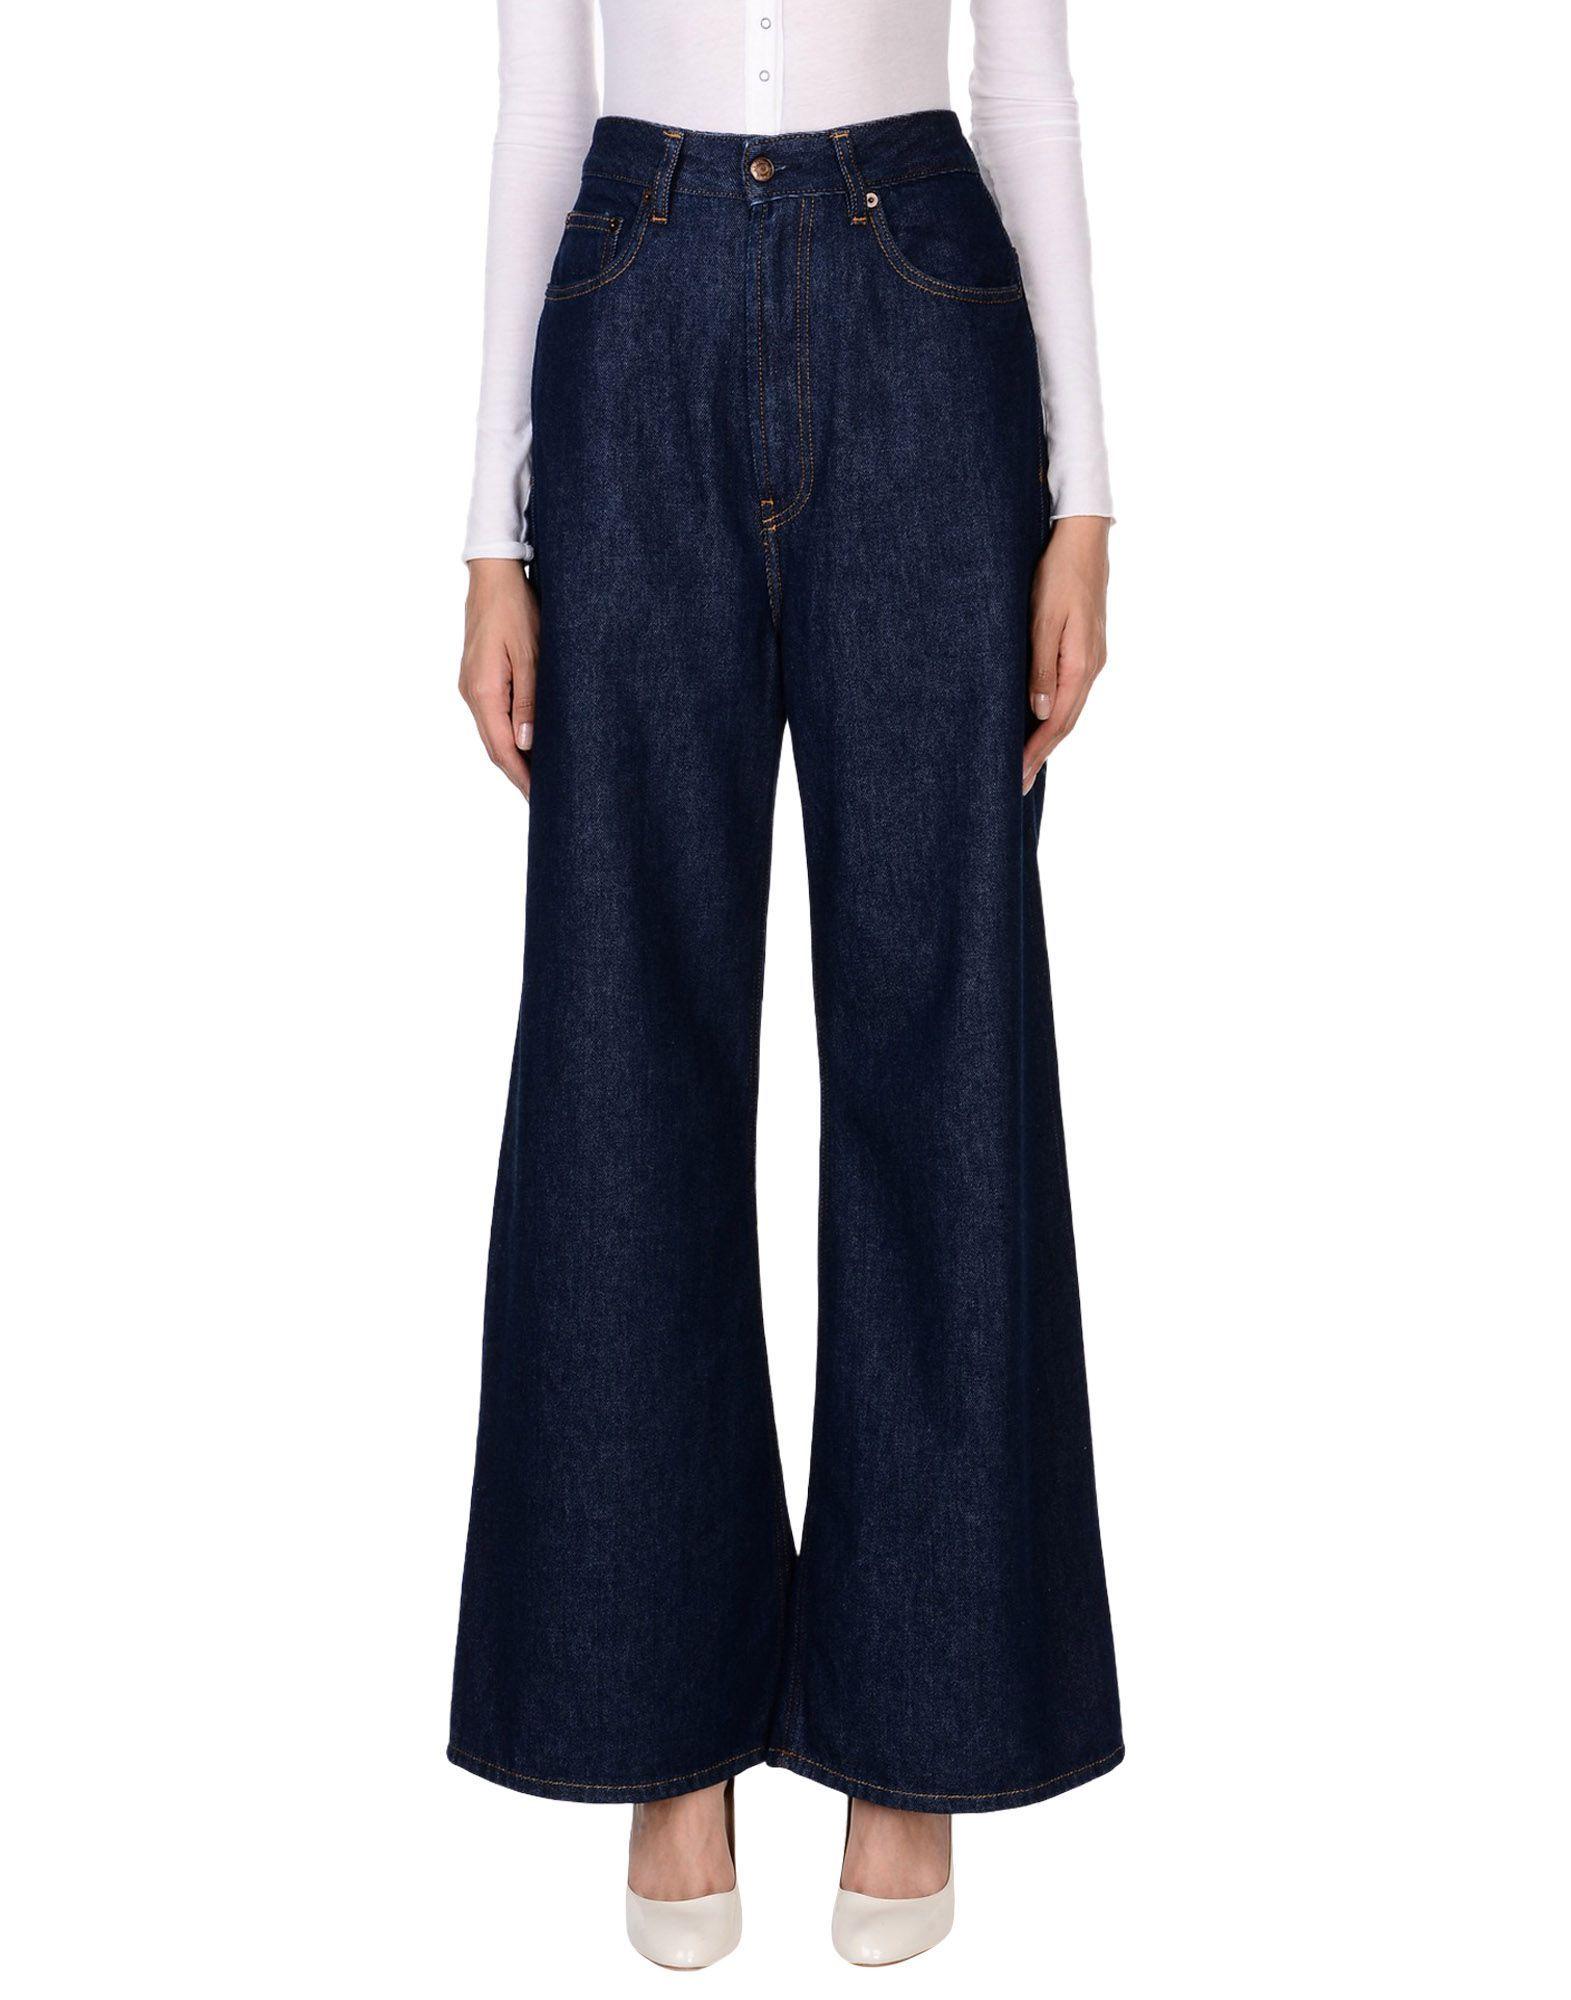 Mauro Grifoni Blue Cotton Pantaloni jeans